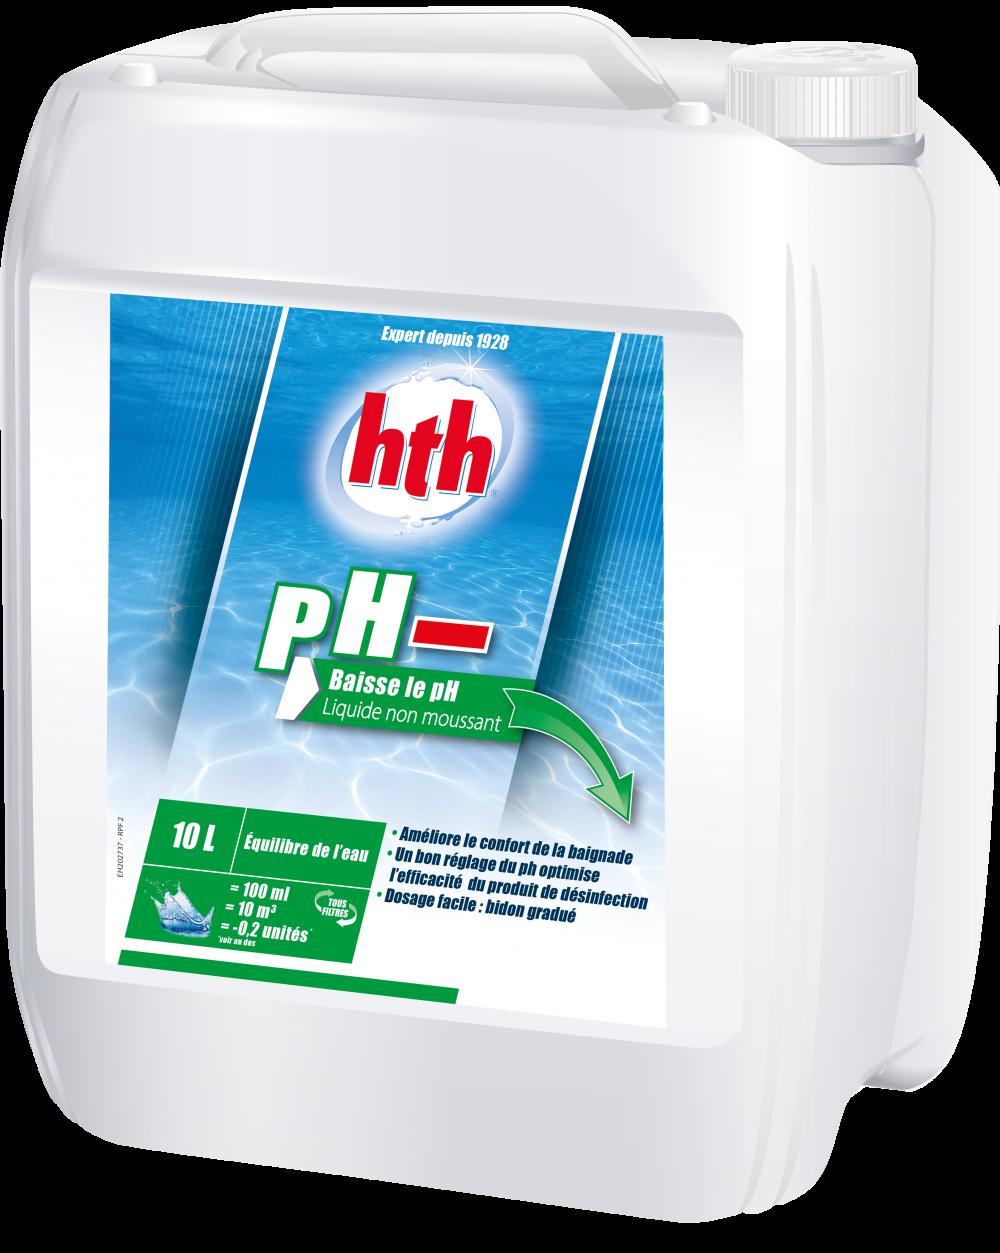 Hth ph moins liquide 35 for Clarifiant liquide piscine